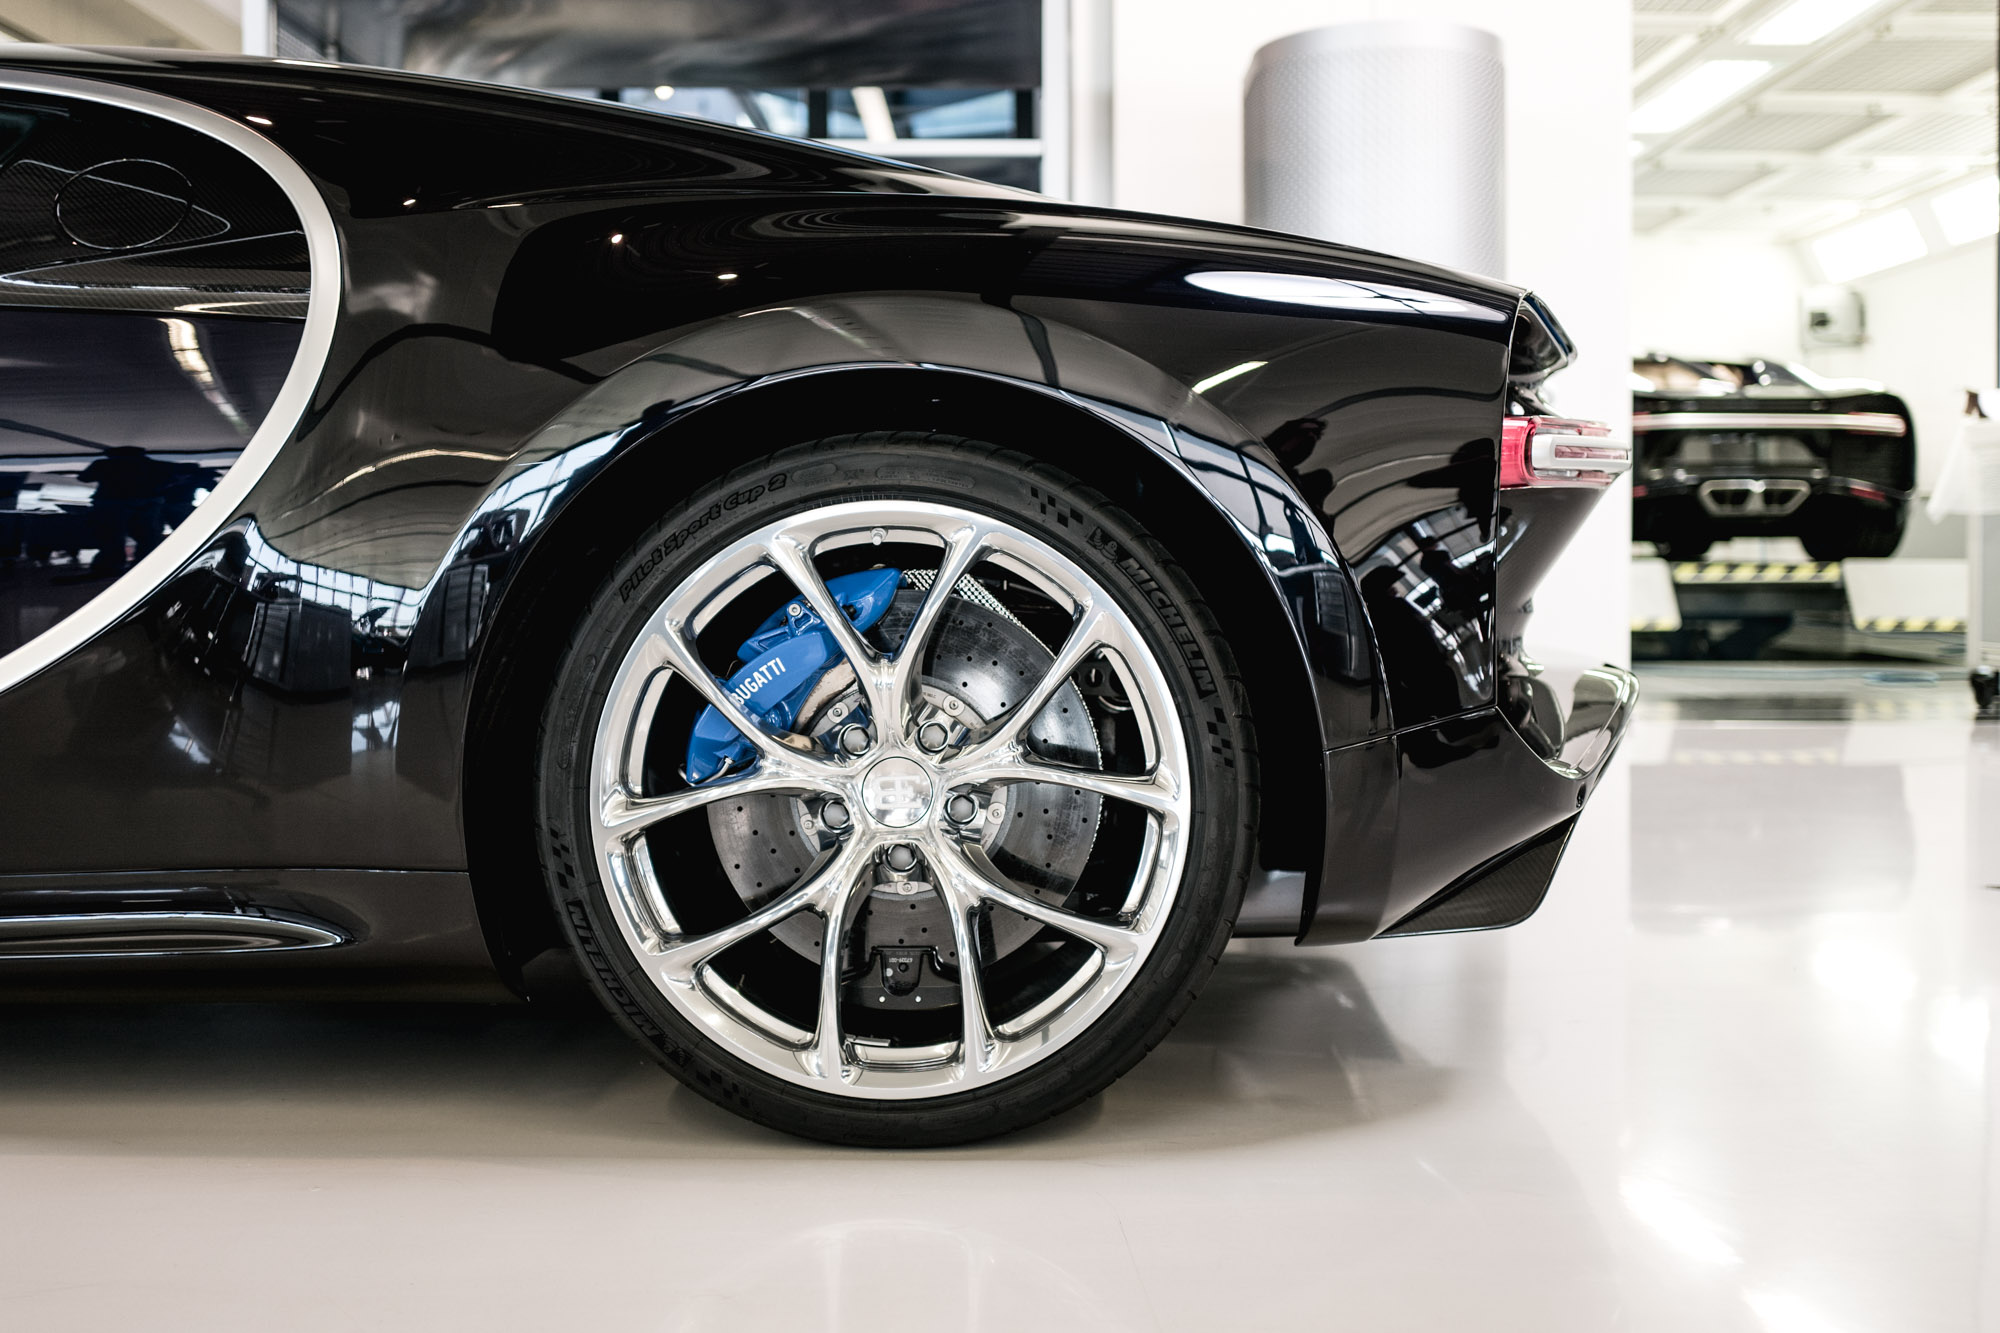 Ateliers Bugatti à Molsheim - Bugatti Chiron - Roue